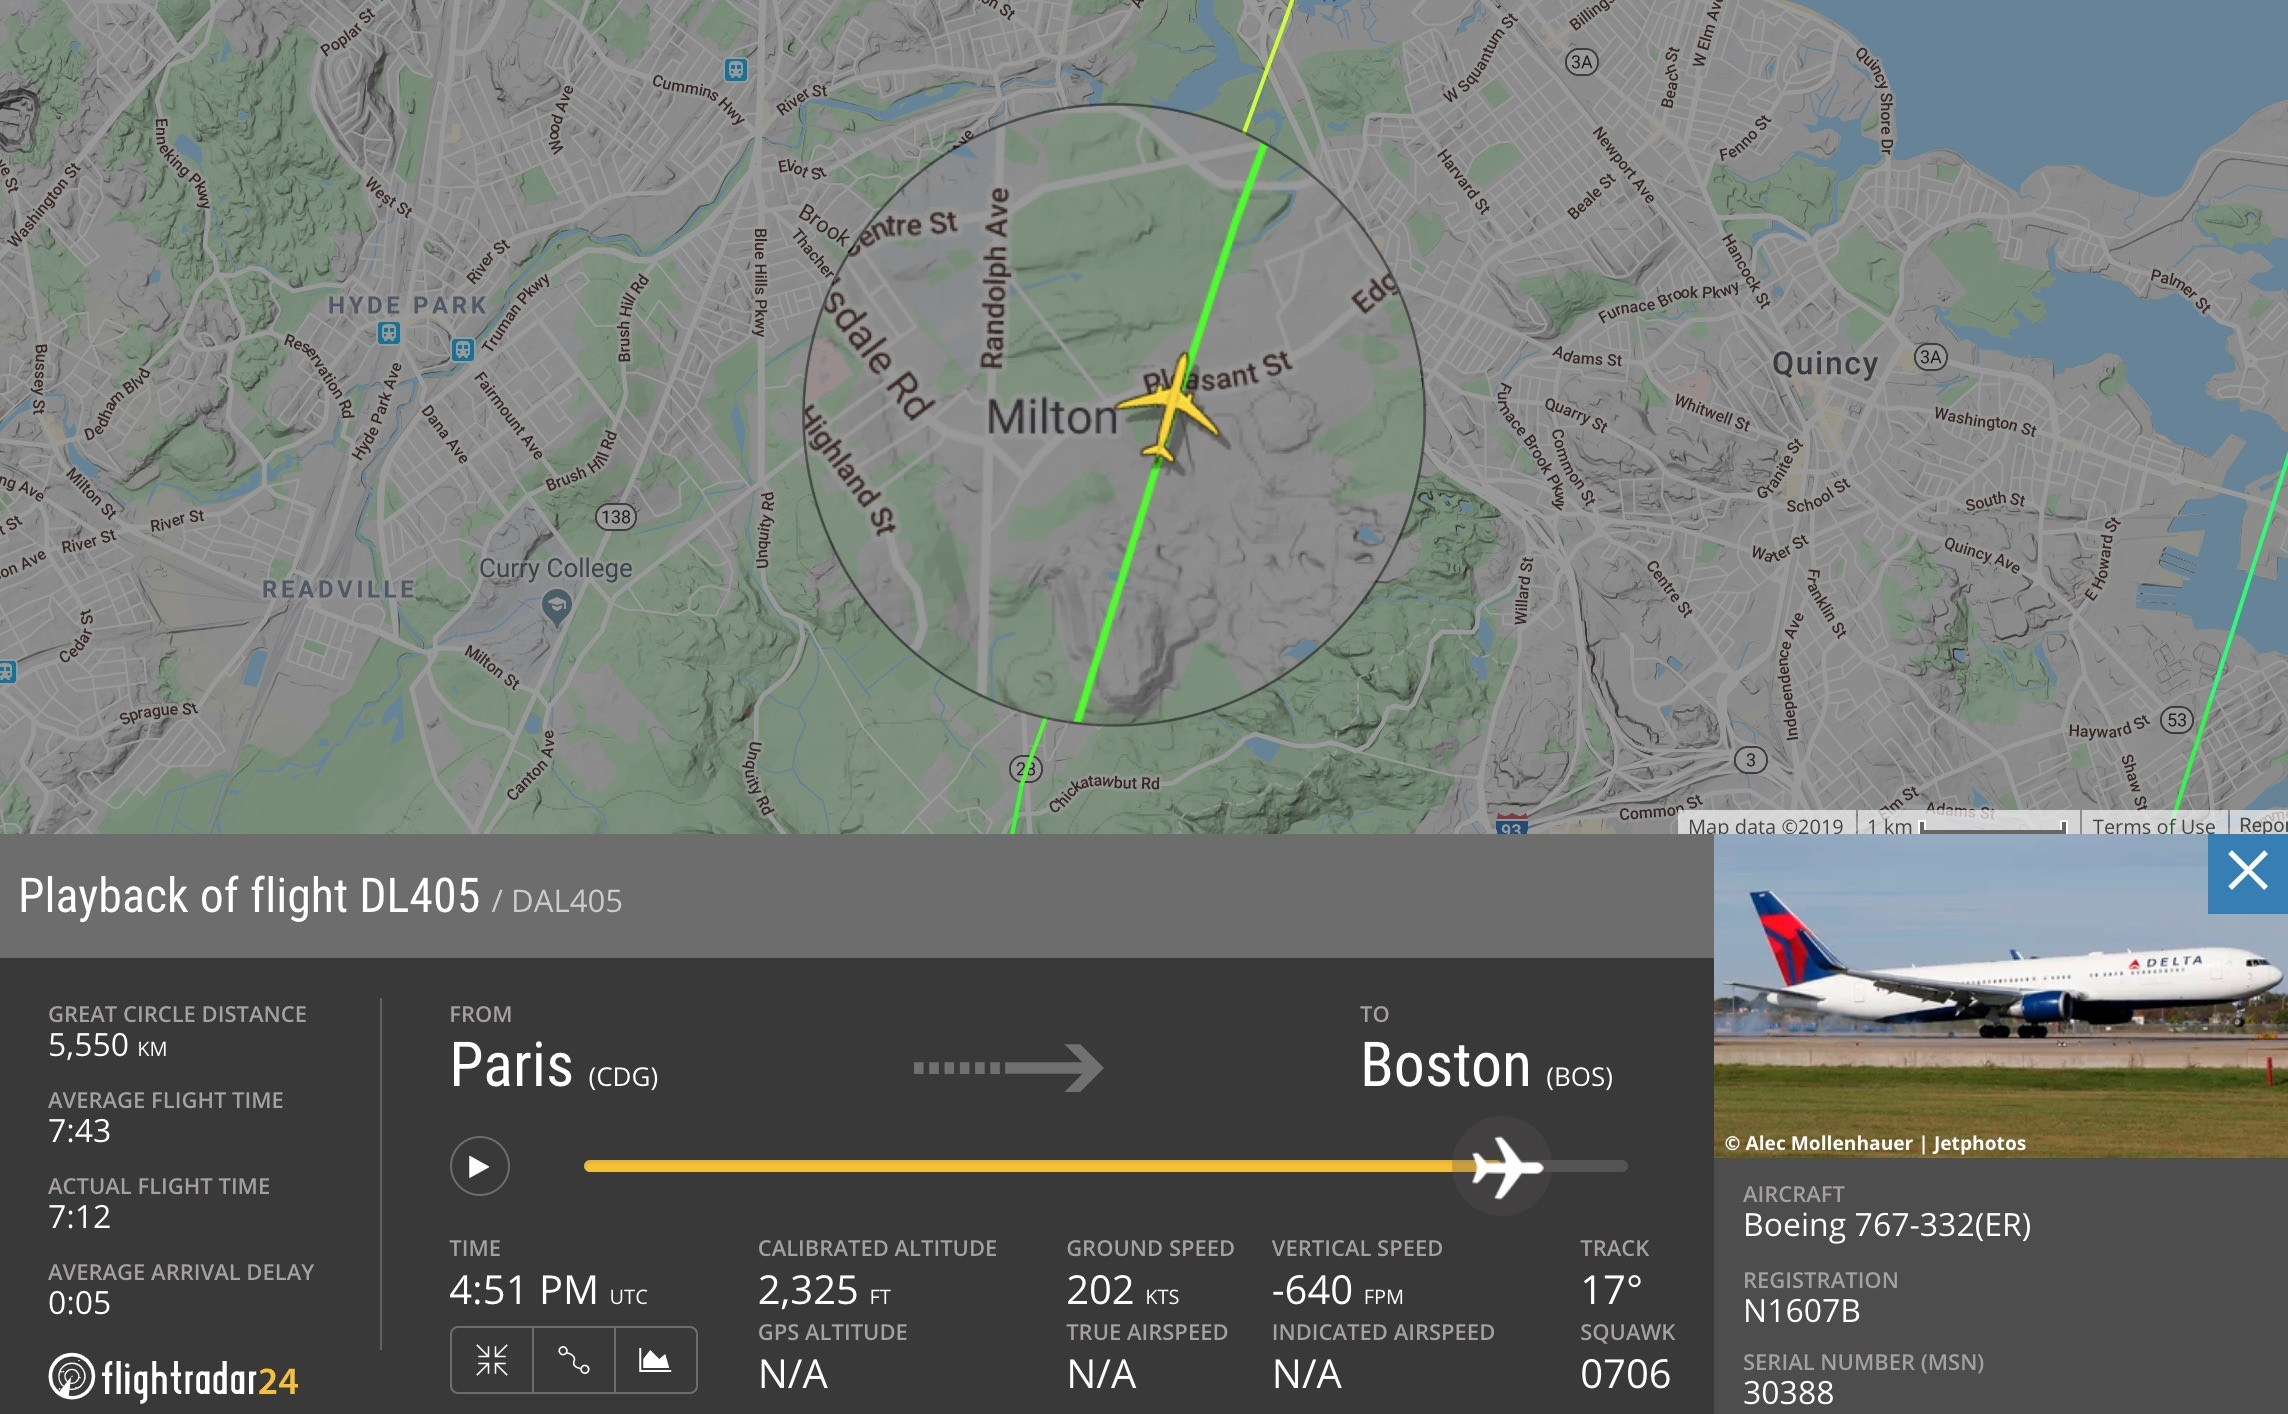 Delta 767 lost an escape slide over Milton, Massachusetts